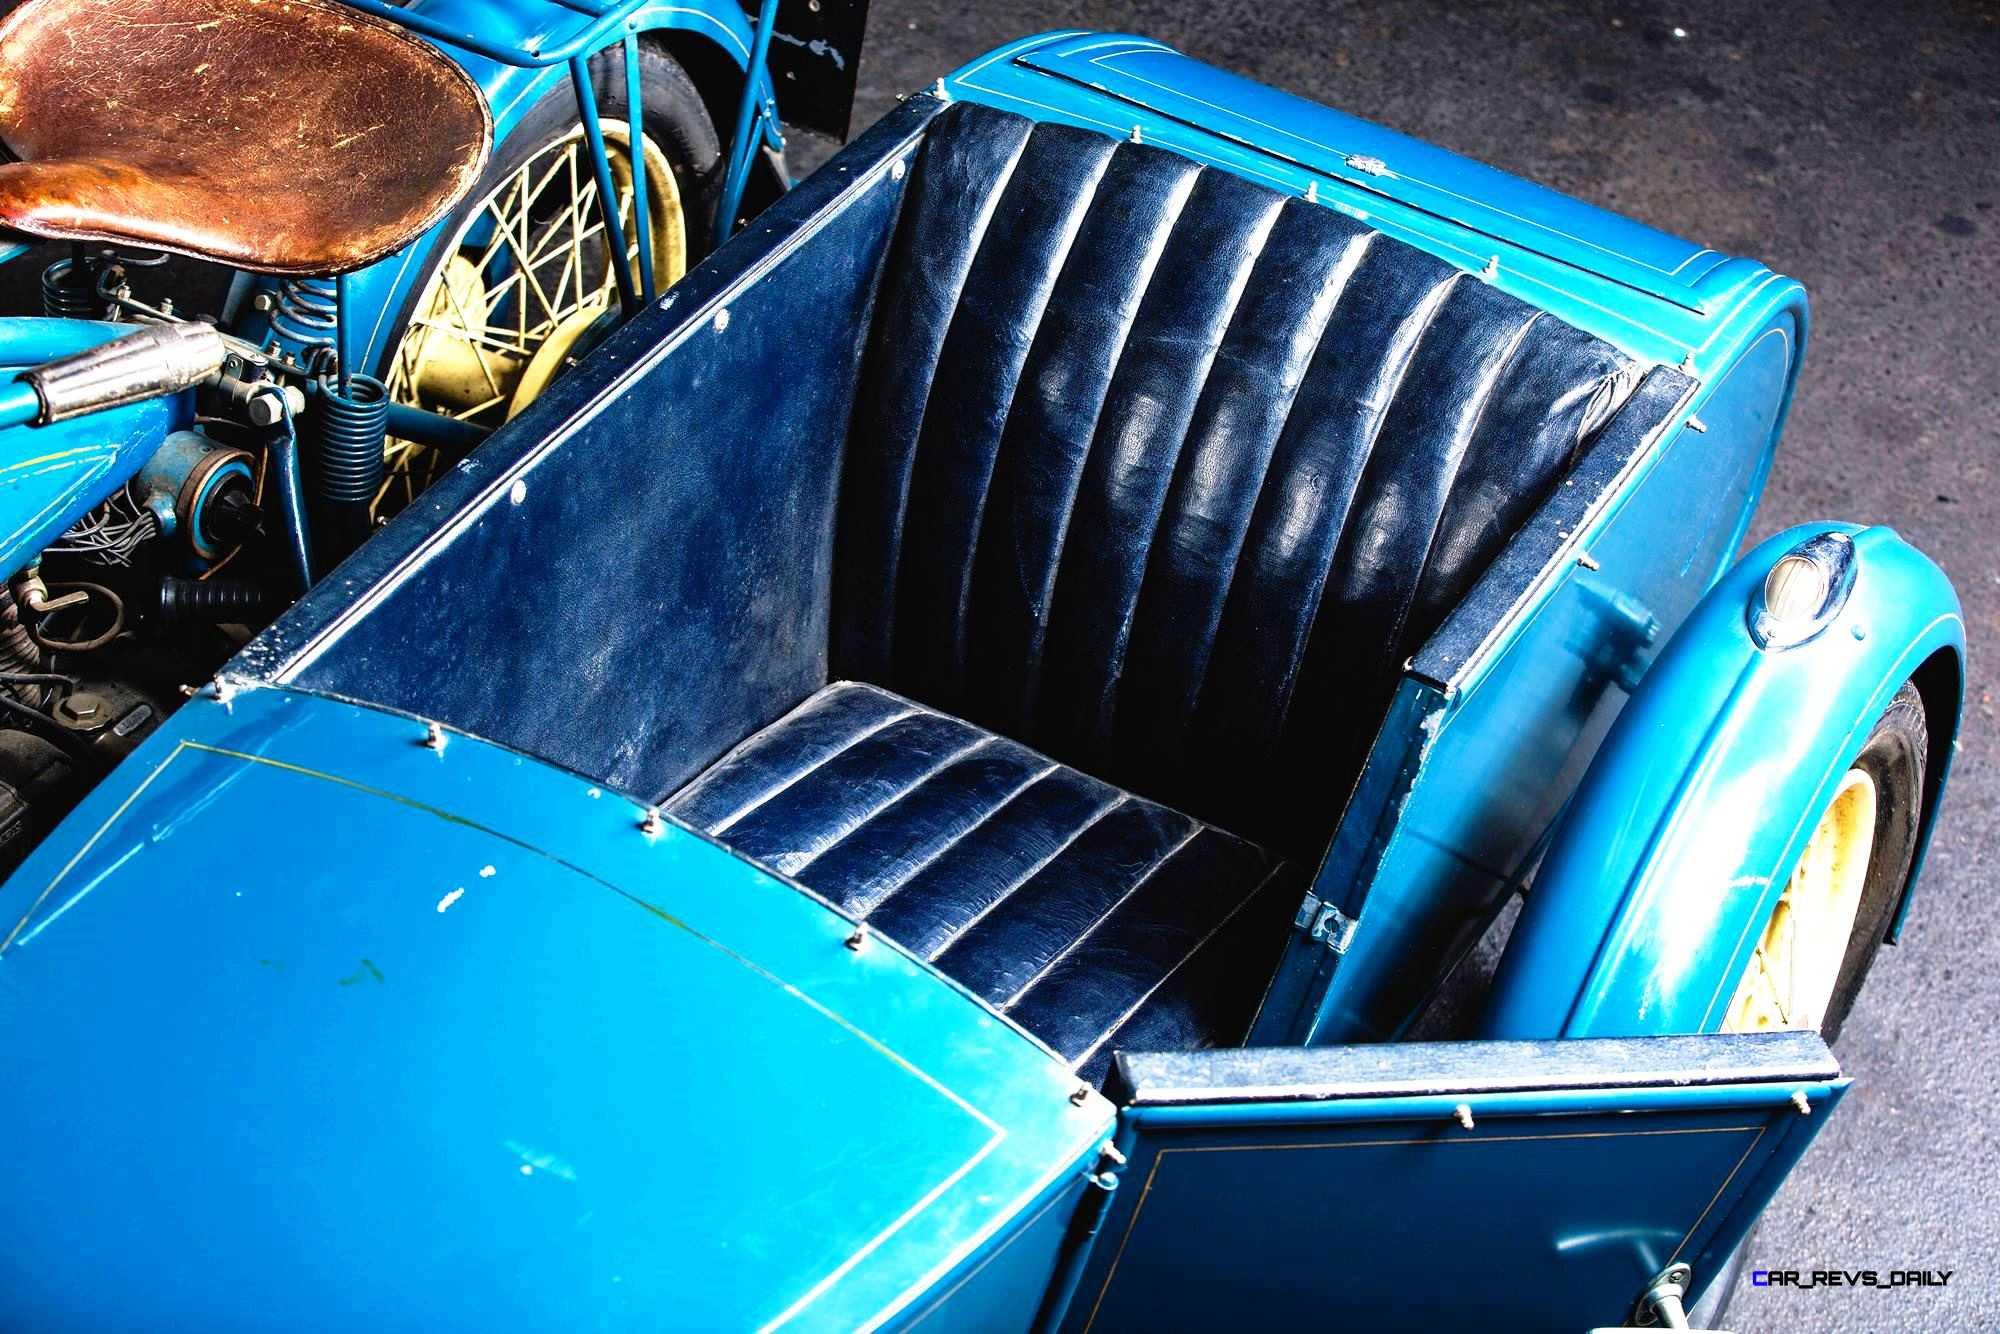 1925-Henderson-De-Luxe-with-Goulding-Sidecar-13.jpg